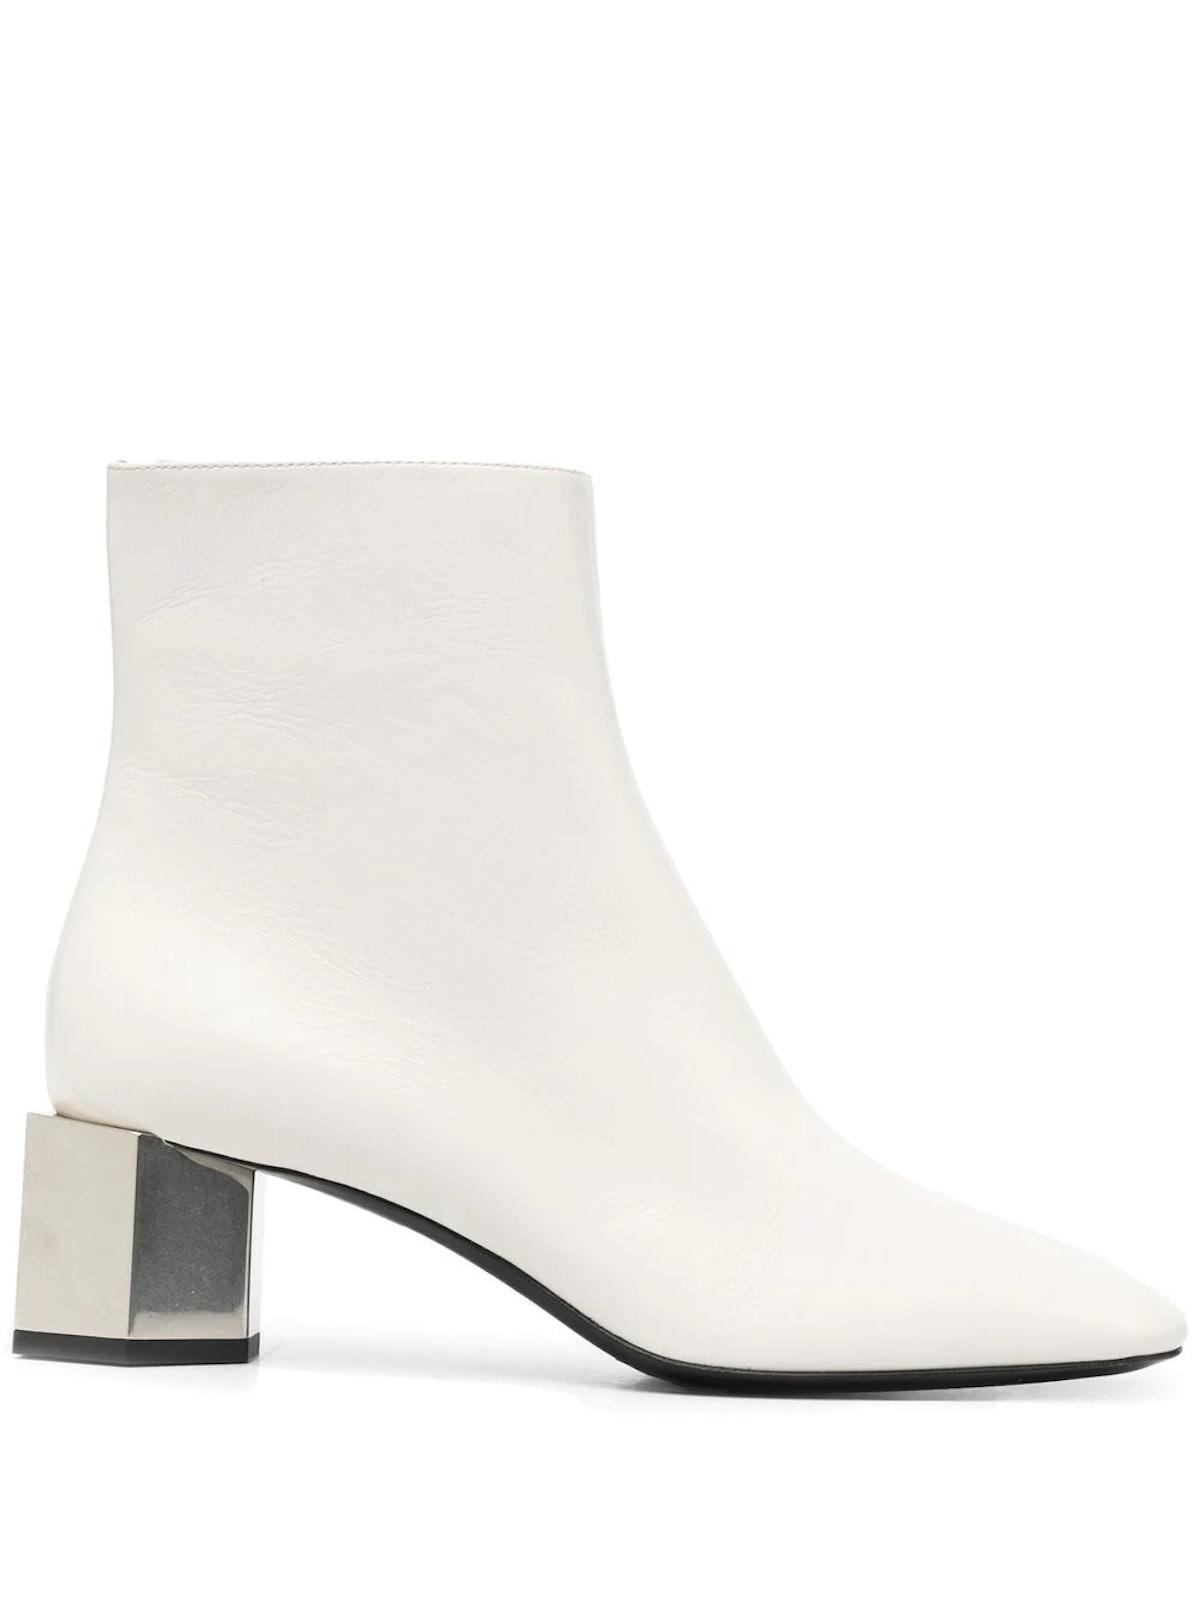 White Block Heel Boots